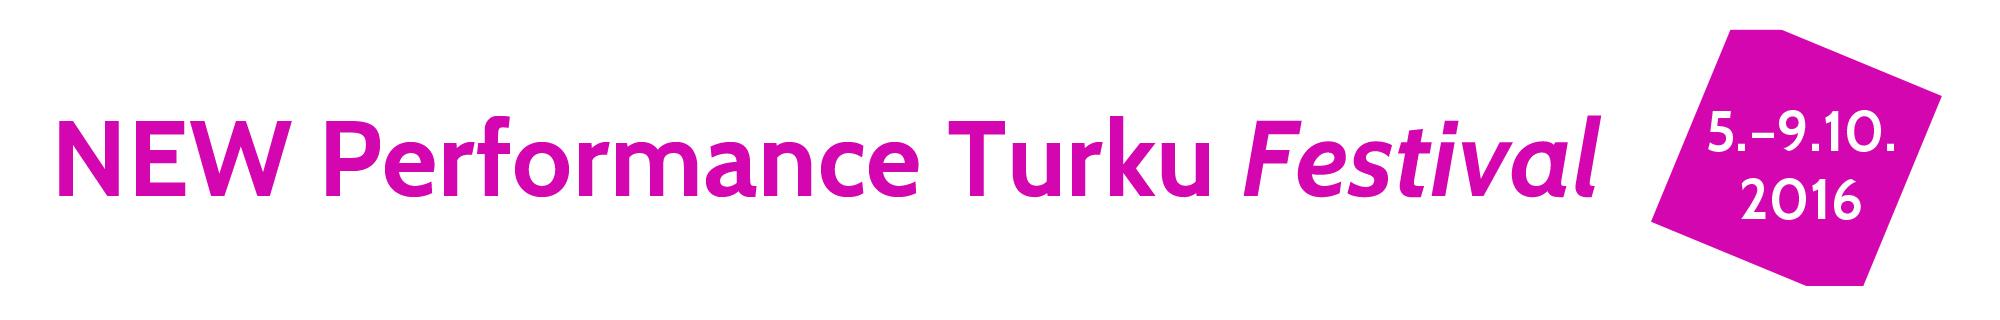 New Performance Turku Festival